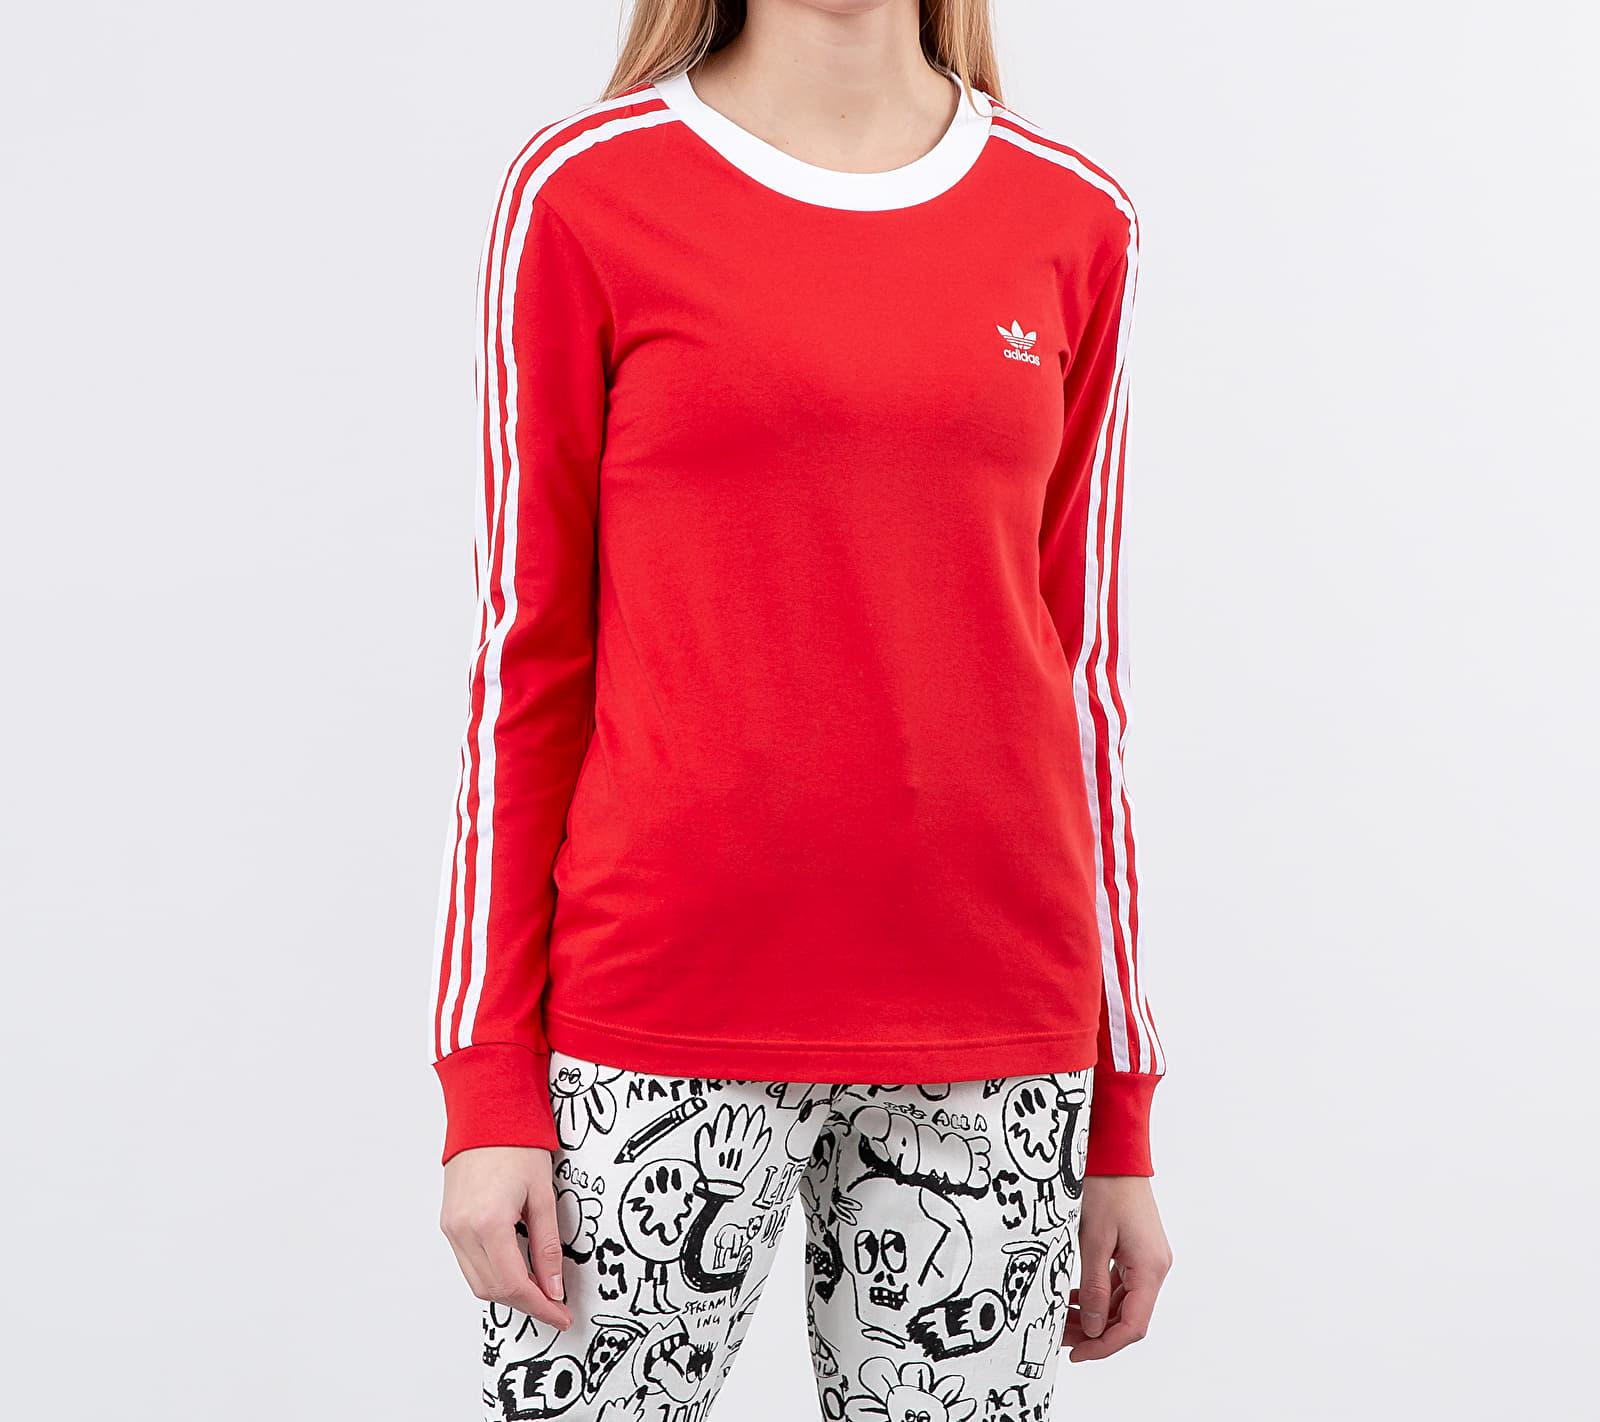 adidas 3 Stripes Longsleeve Tee Lush Red/ White